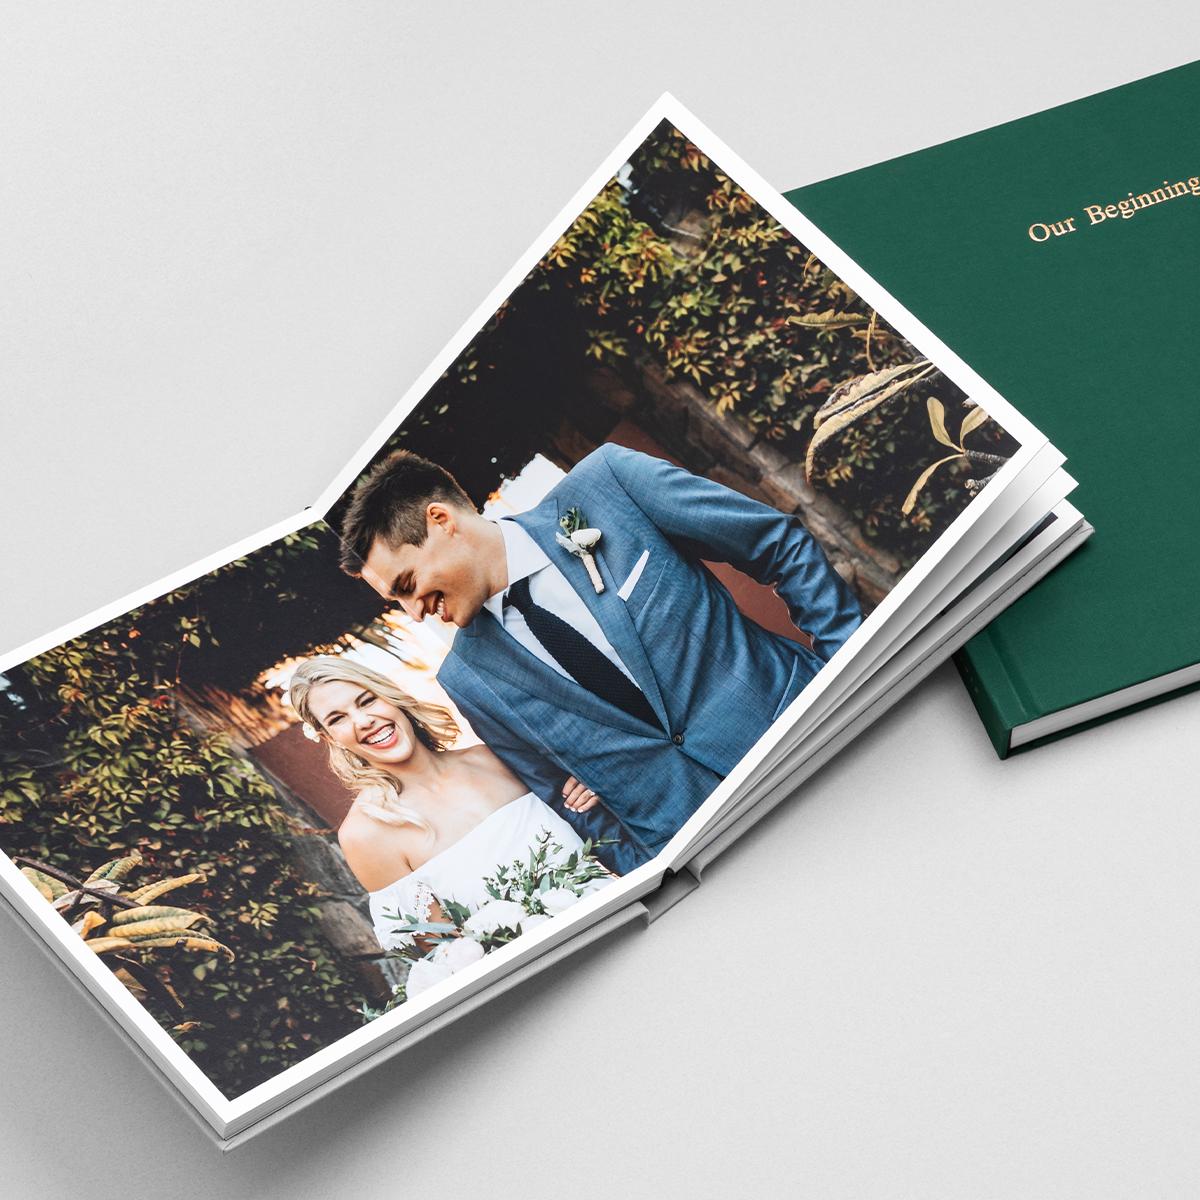 Wedding Layflat Album opened to panoramic spread of newlywed couple on wedding day